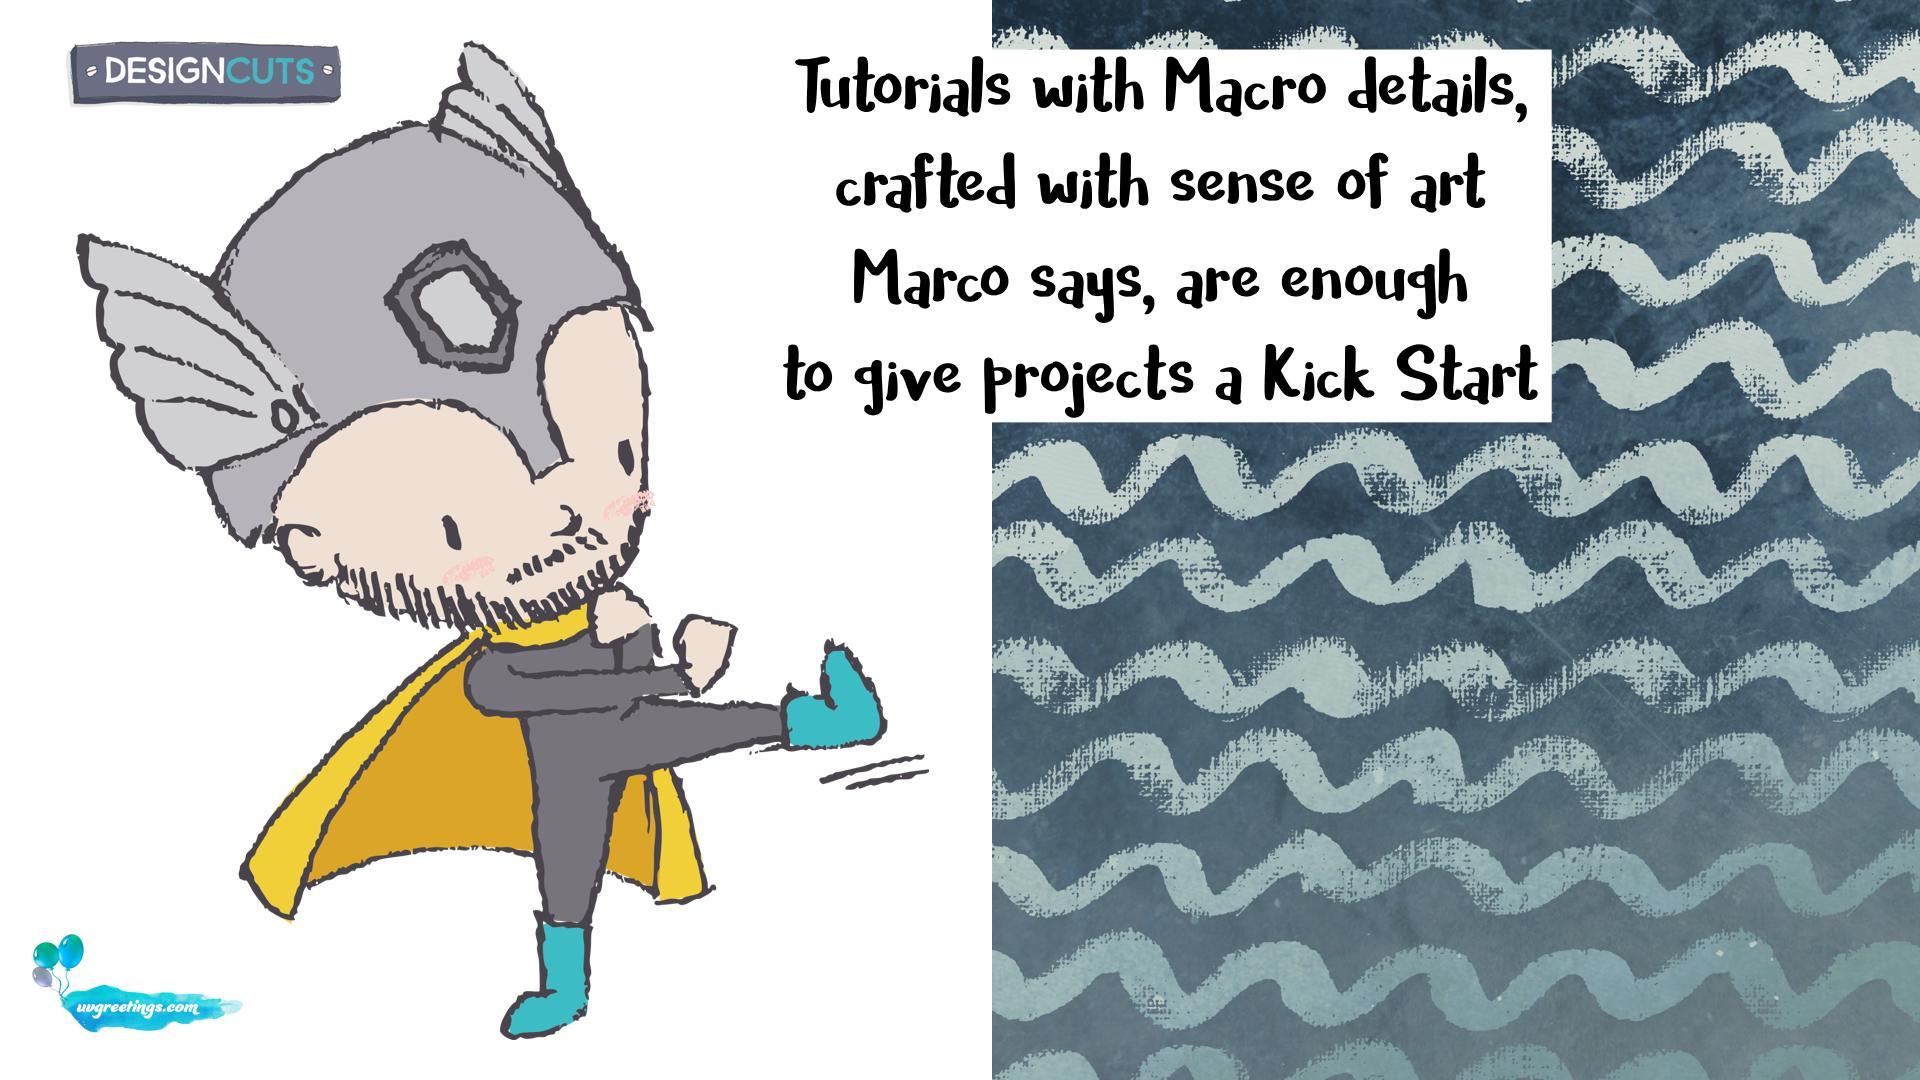 Marco - Design Cuts B'day Card